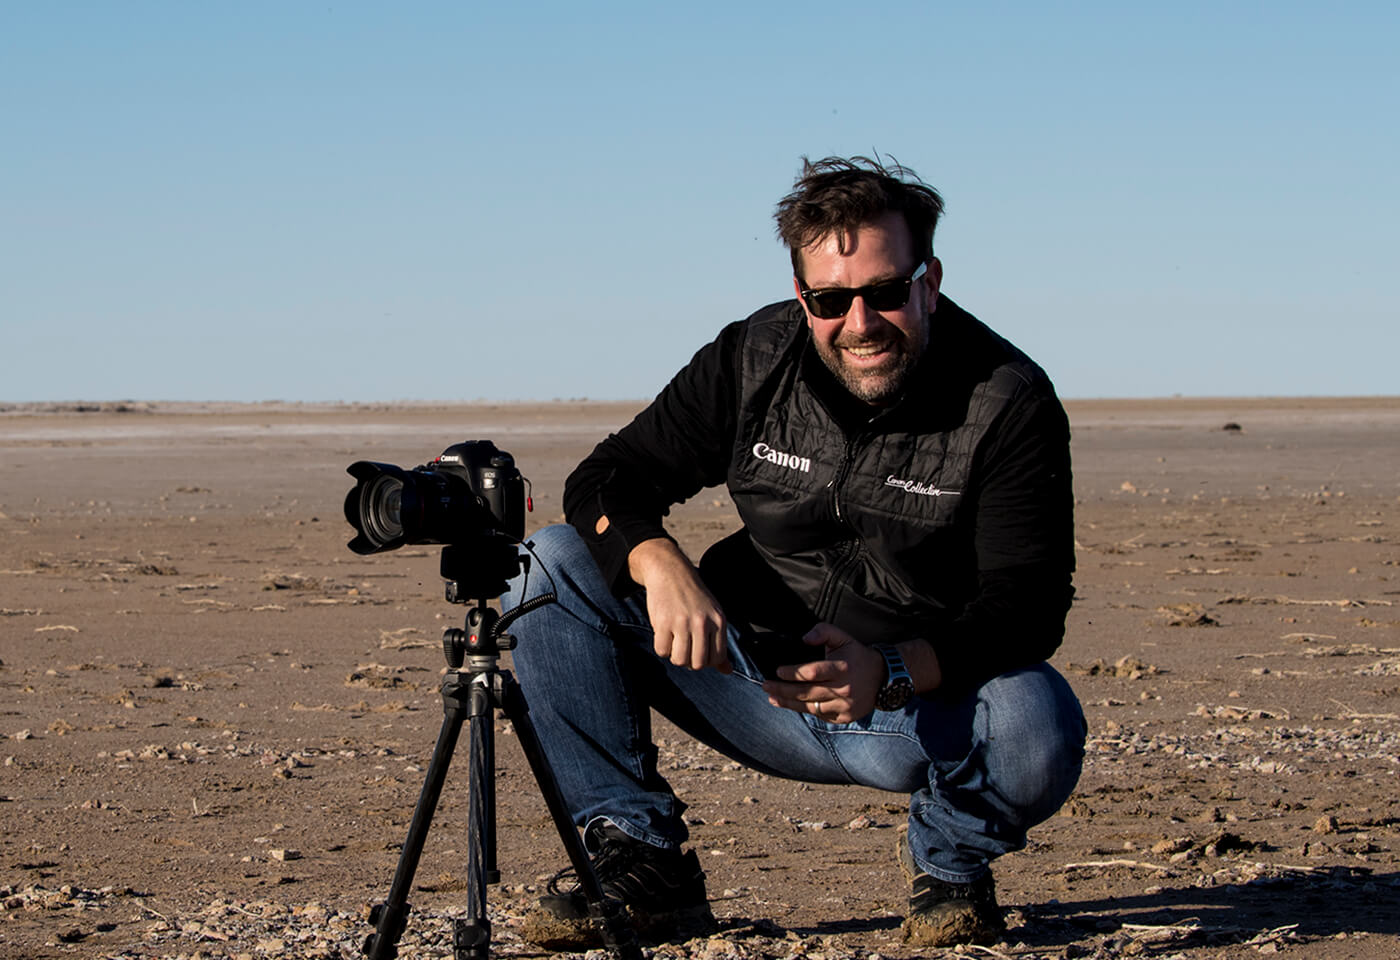 Canon Collective Ambassador Steve Huddy